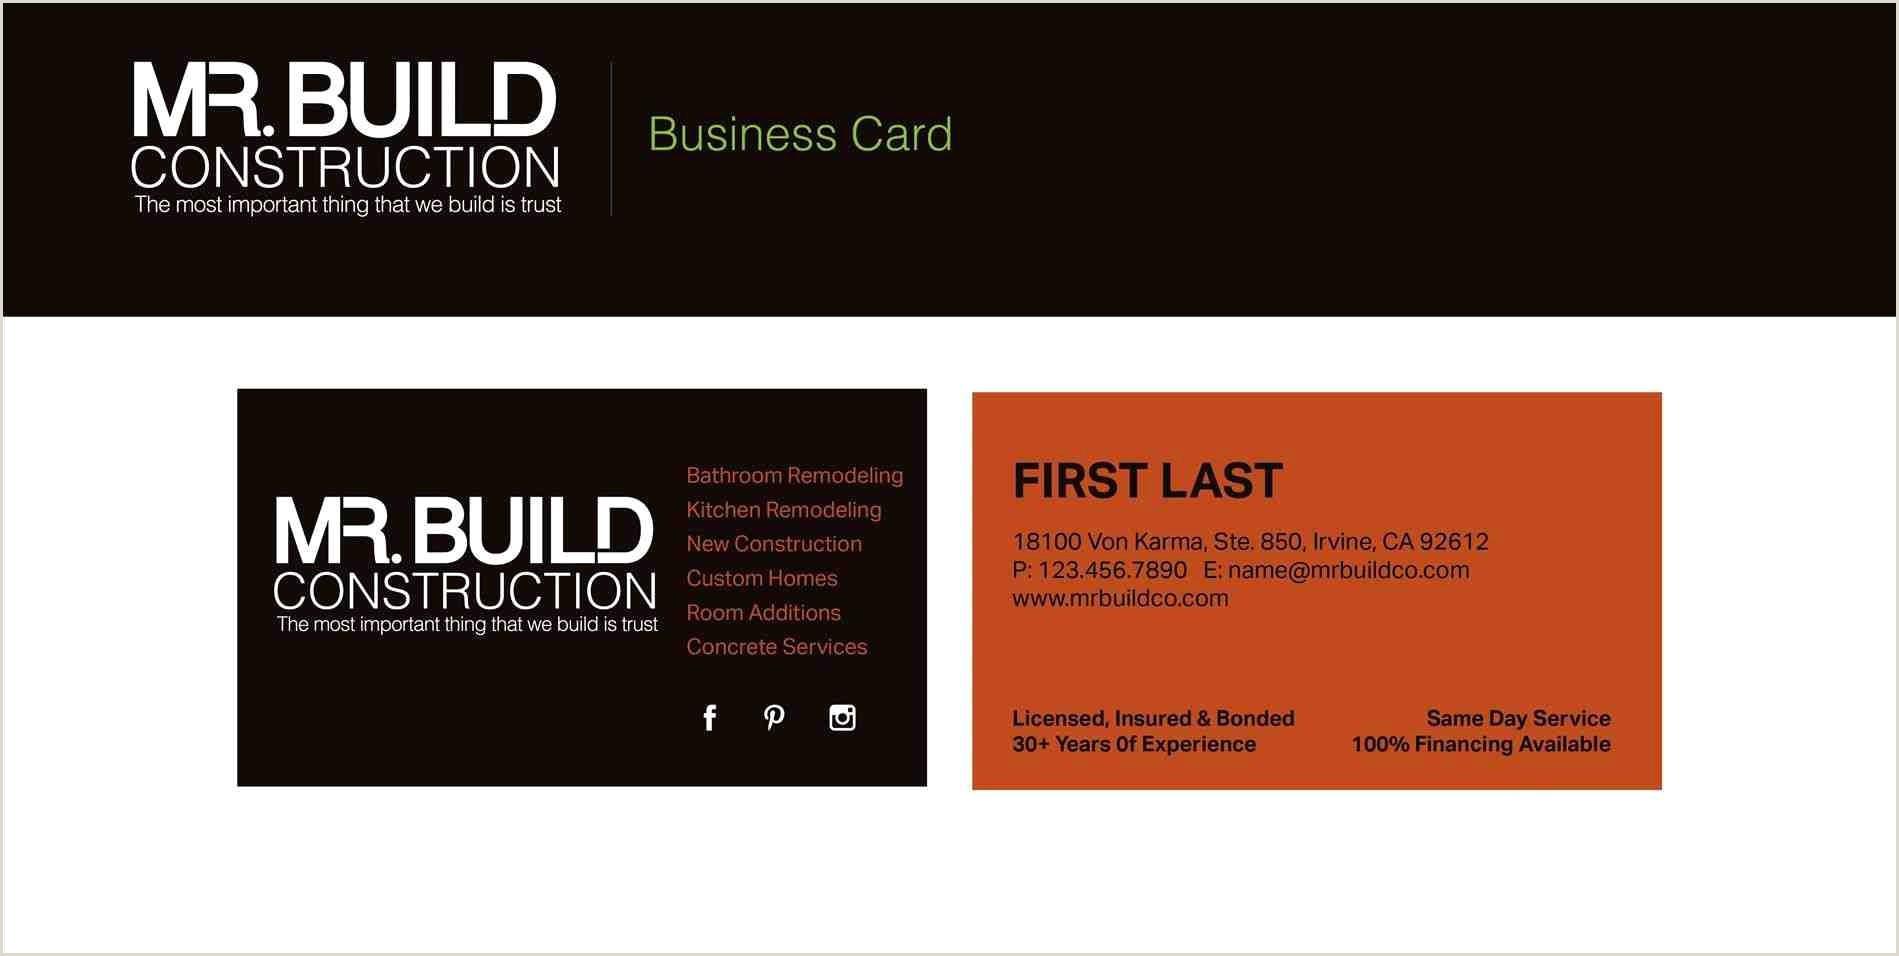 Calling Card Ideas 14 Popular Hardwood Flooring Business Card Template